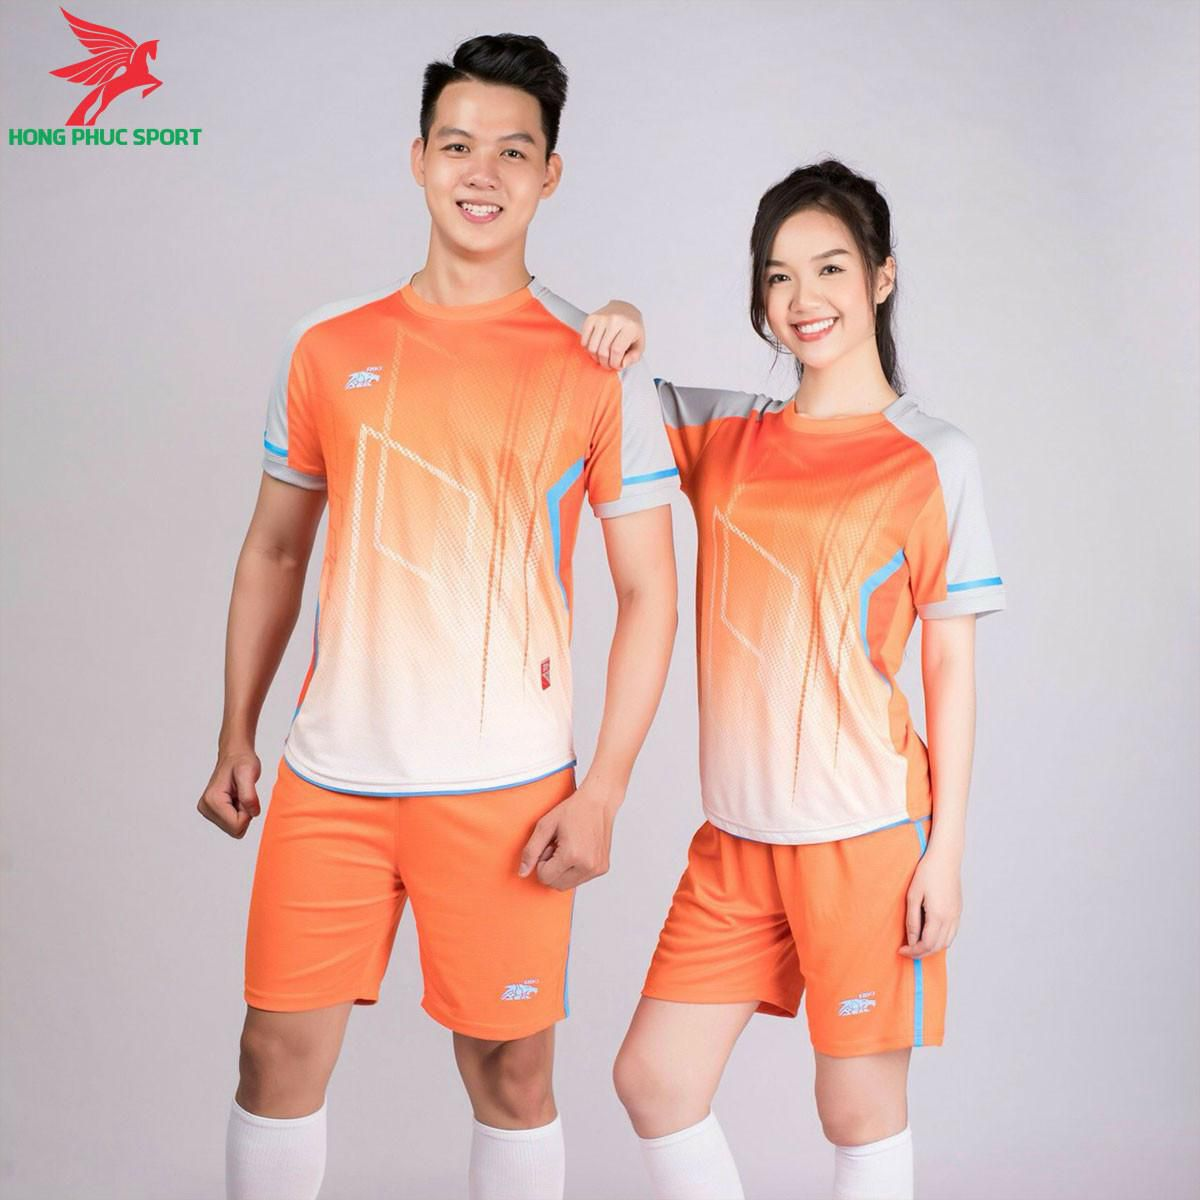 https://cdn.hongphucsport.com/unsafe/s4.shopbay.vn/files/285/ao-khong-logo-riki-airmaxx-mau-cam-2-603eed16bab1f.jpg